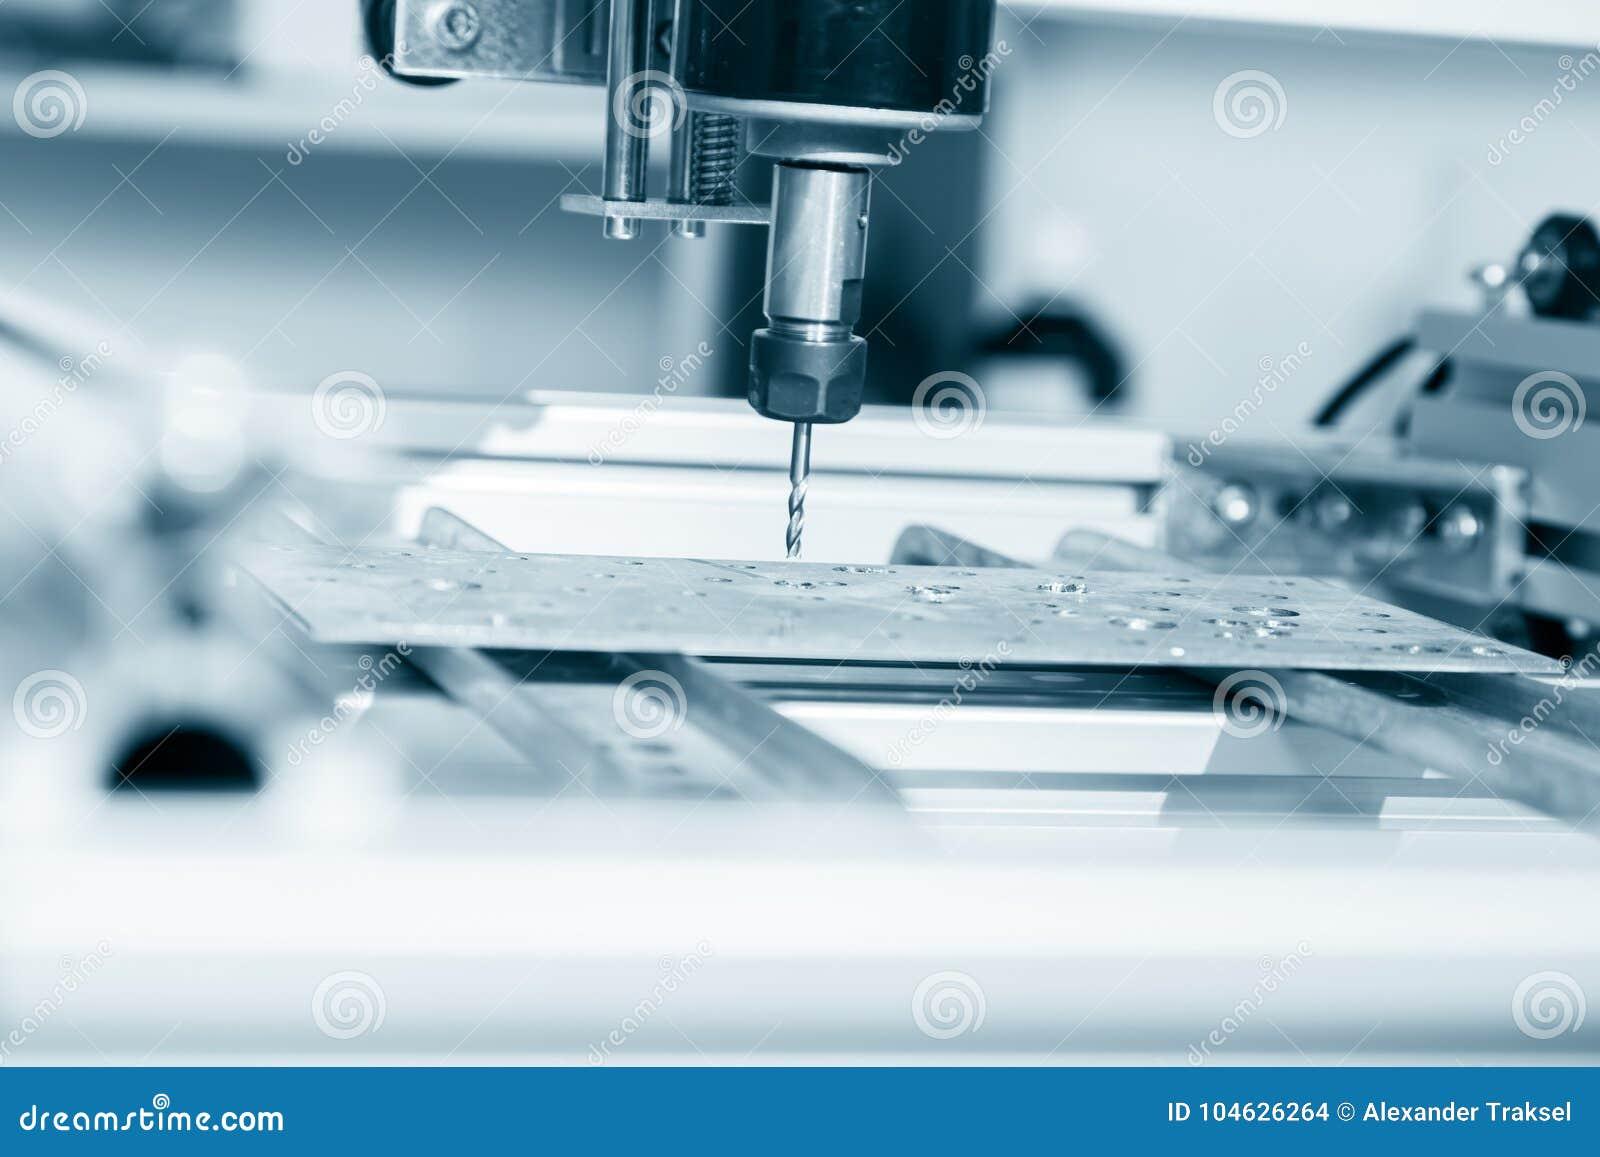 Download Malenmachine Die Aan Staaldetail Werken CNC Malenmachine Die, Snijdende Metaalbewerking Processn Werken Stock Foto - Afbeelding bestaande uit up, fabriek: 104626264